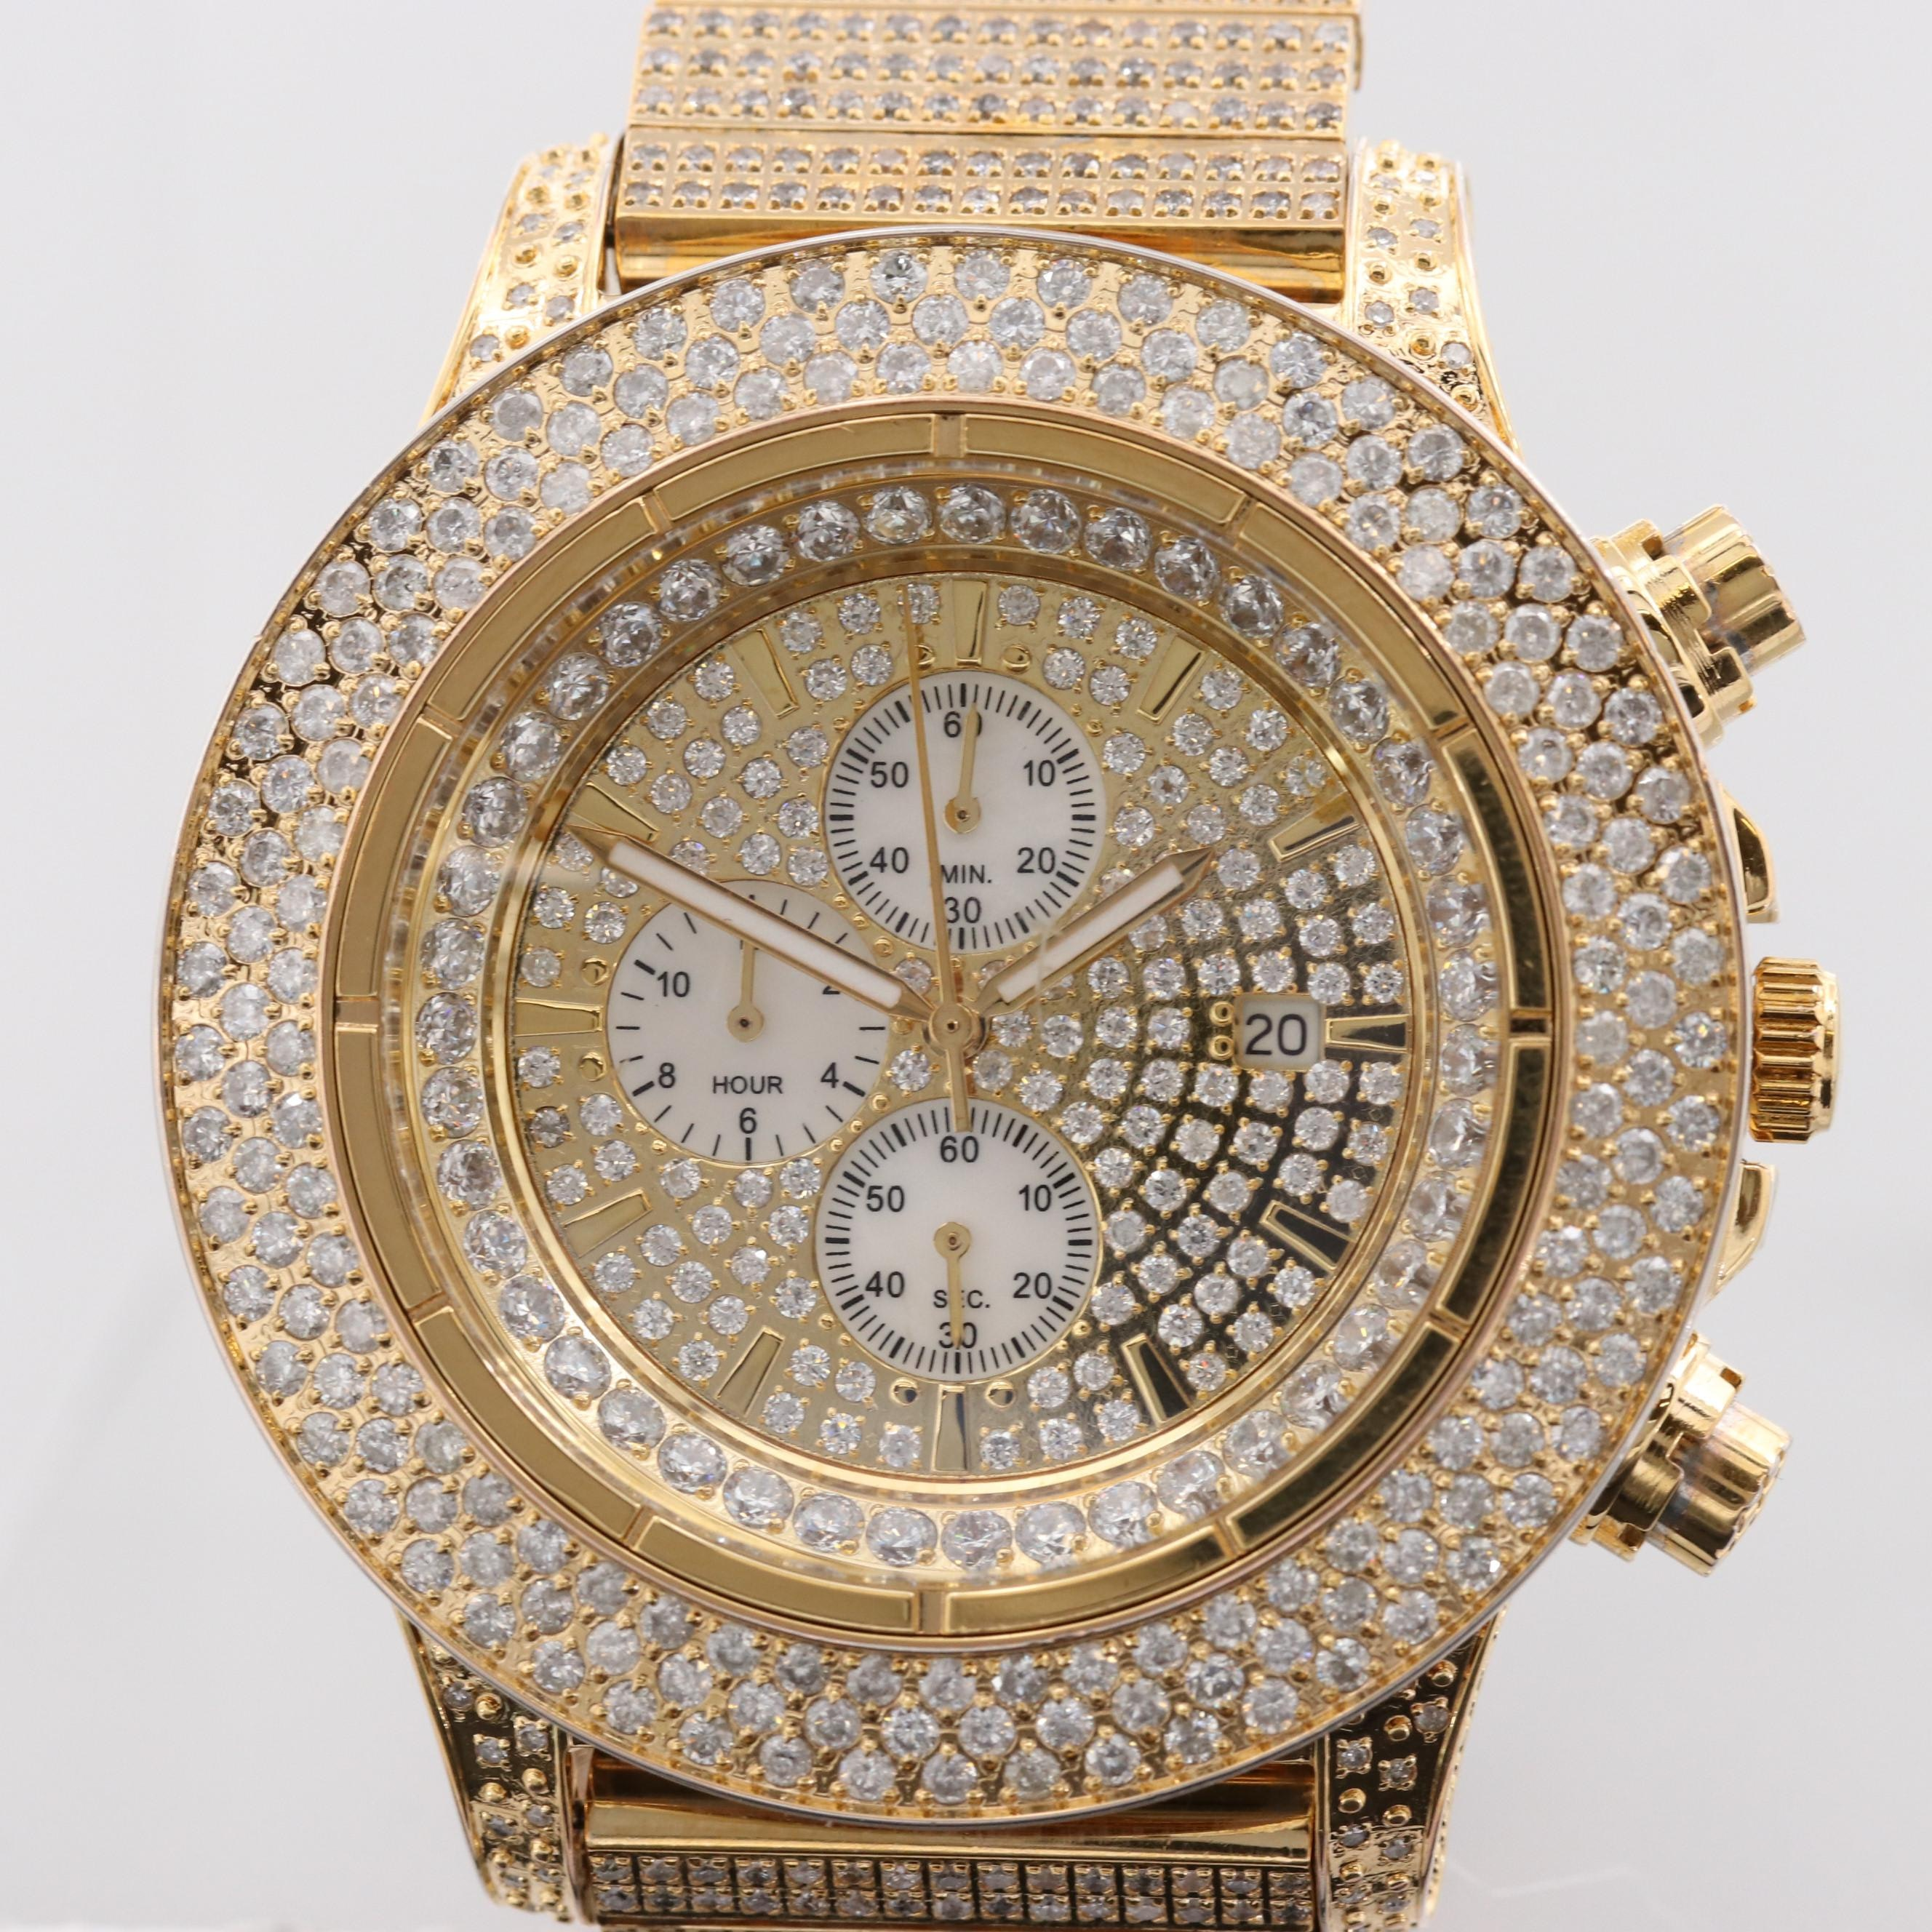 Icetime International Gold Tone 11.15 CTW Diamond Chronograph Quartz Wristwatch